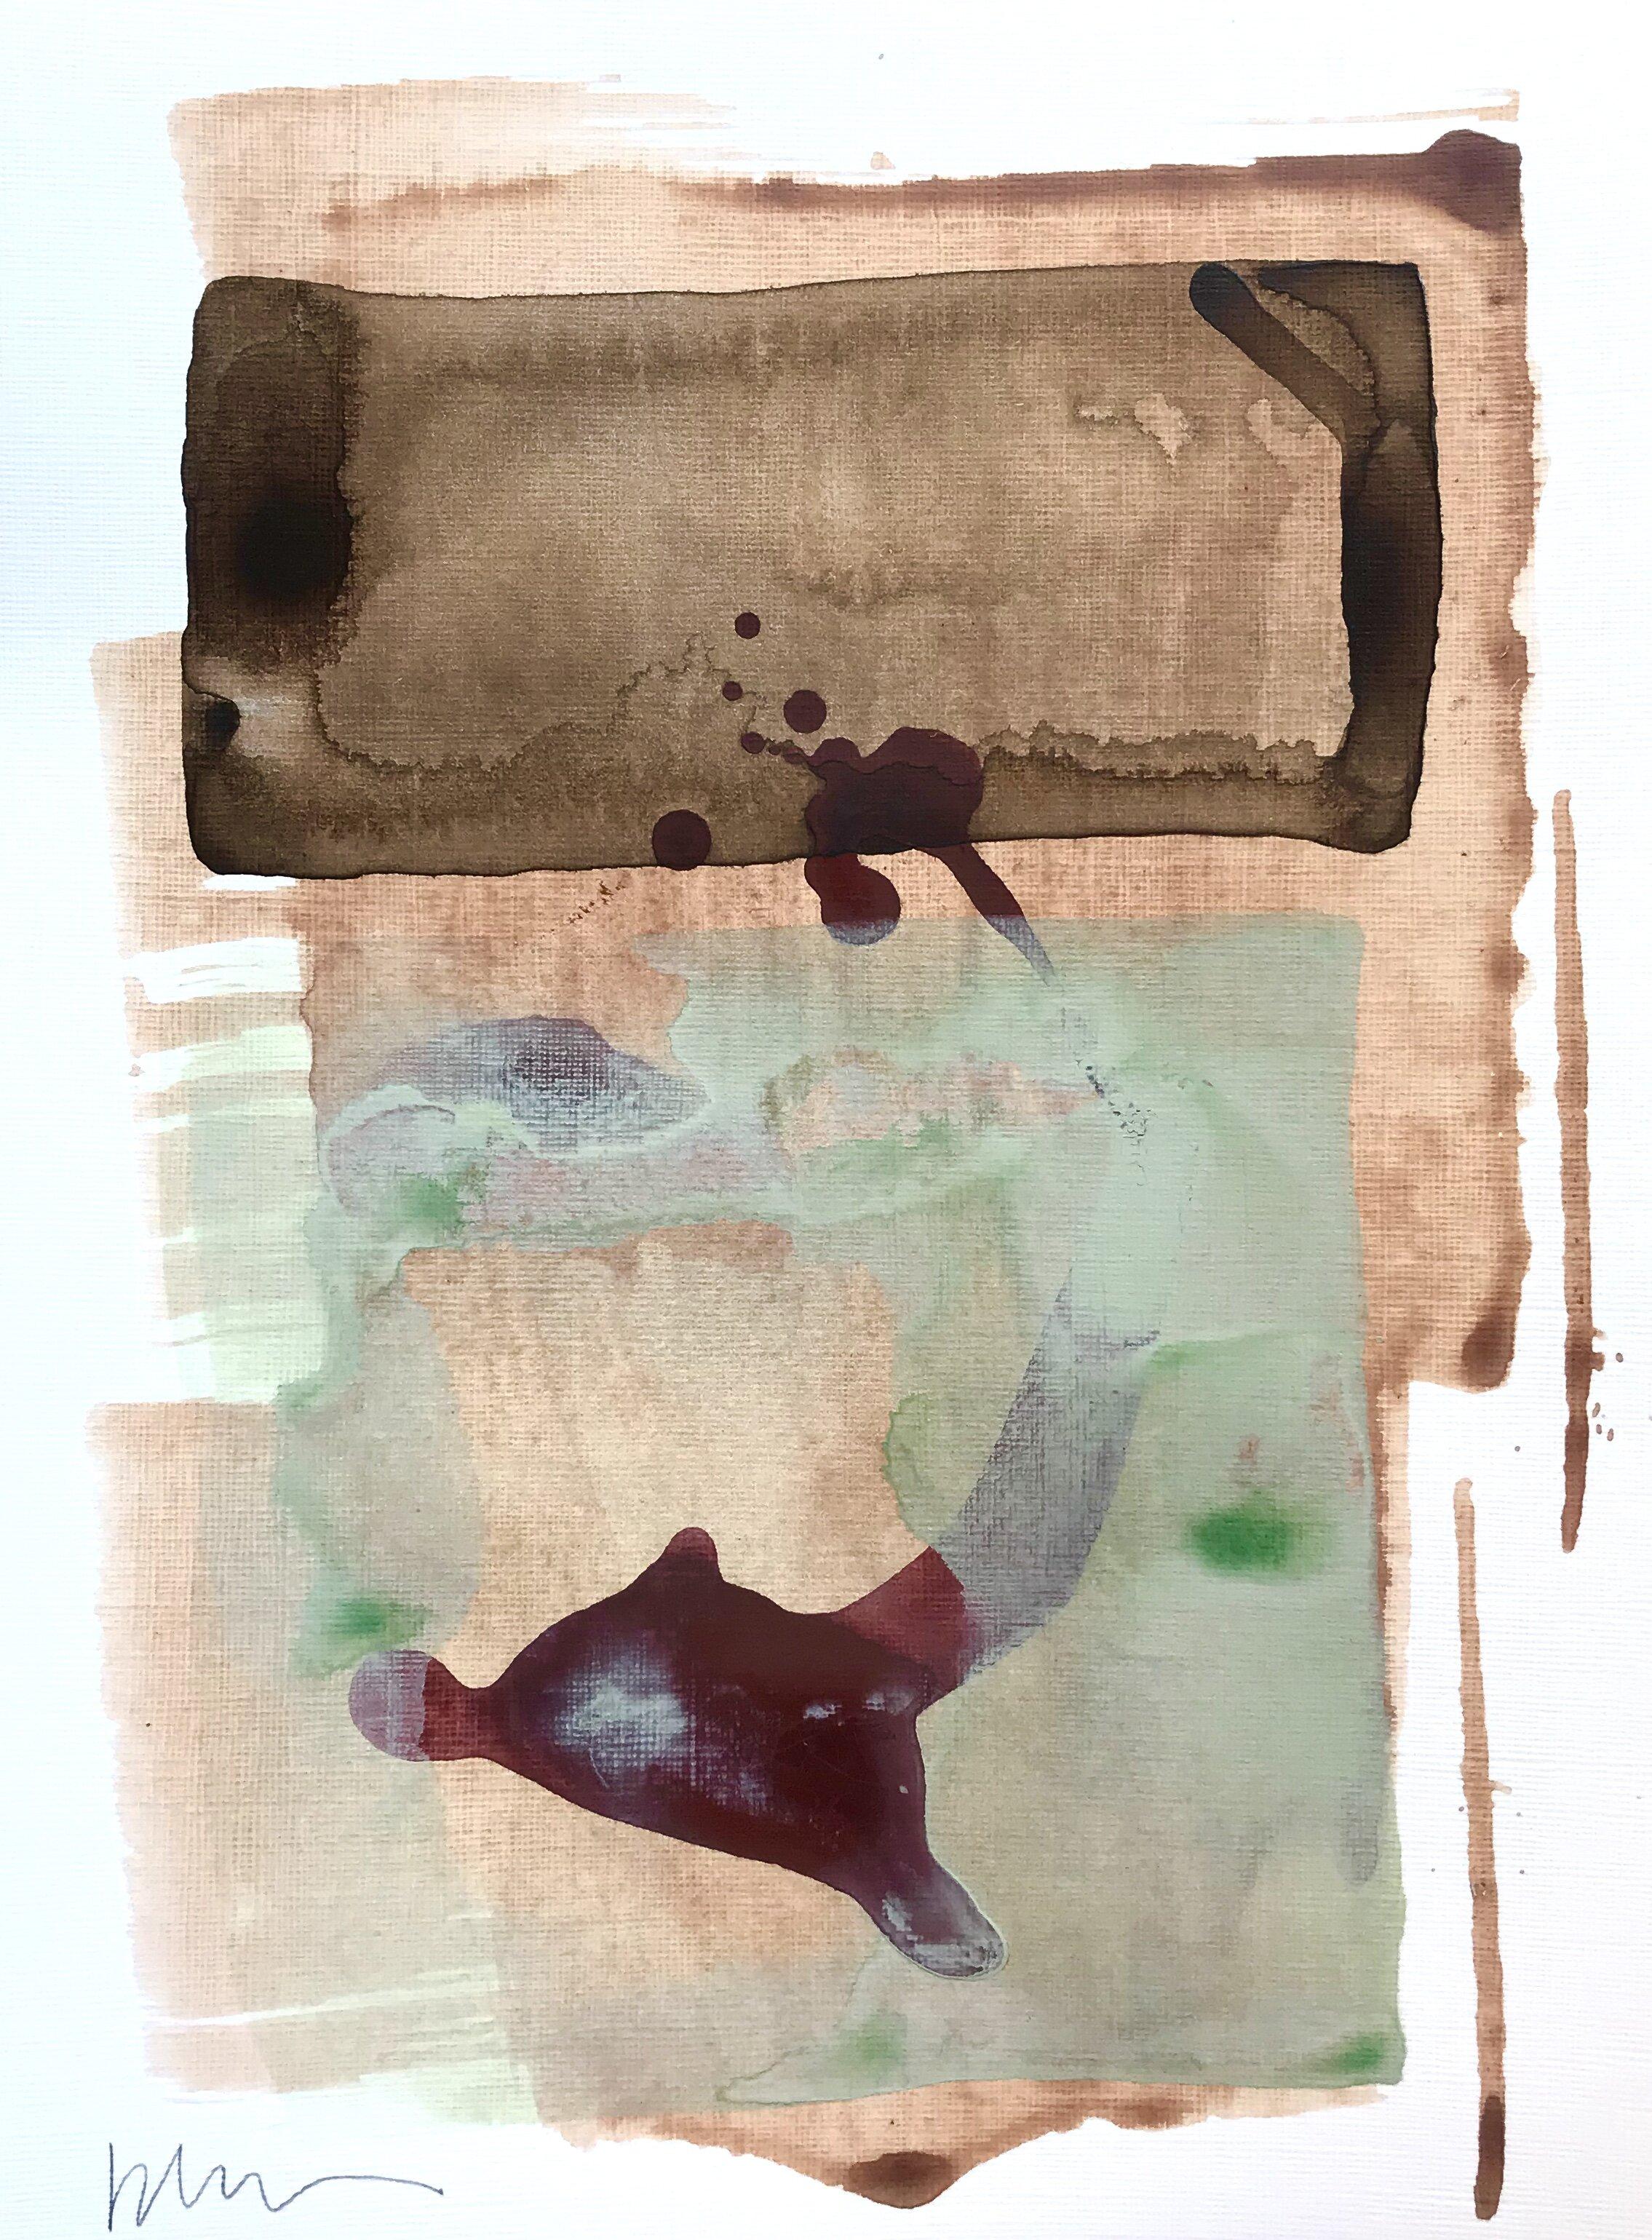 Britt McGraw 9x12 acrylic on heavyweight paper_%22Splashed Leaves%22 #3_$150.jpg